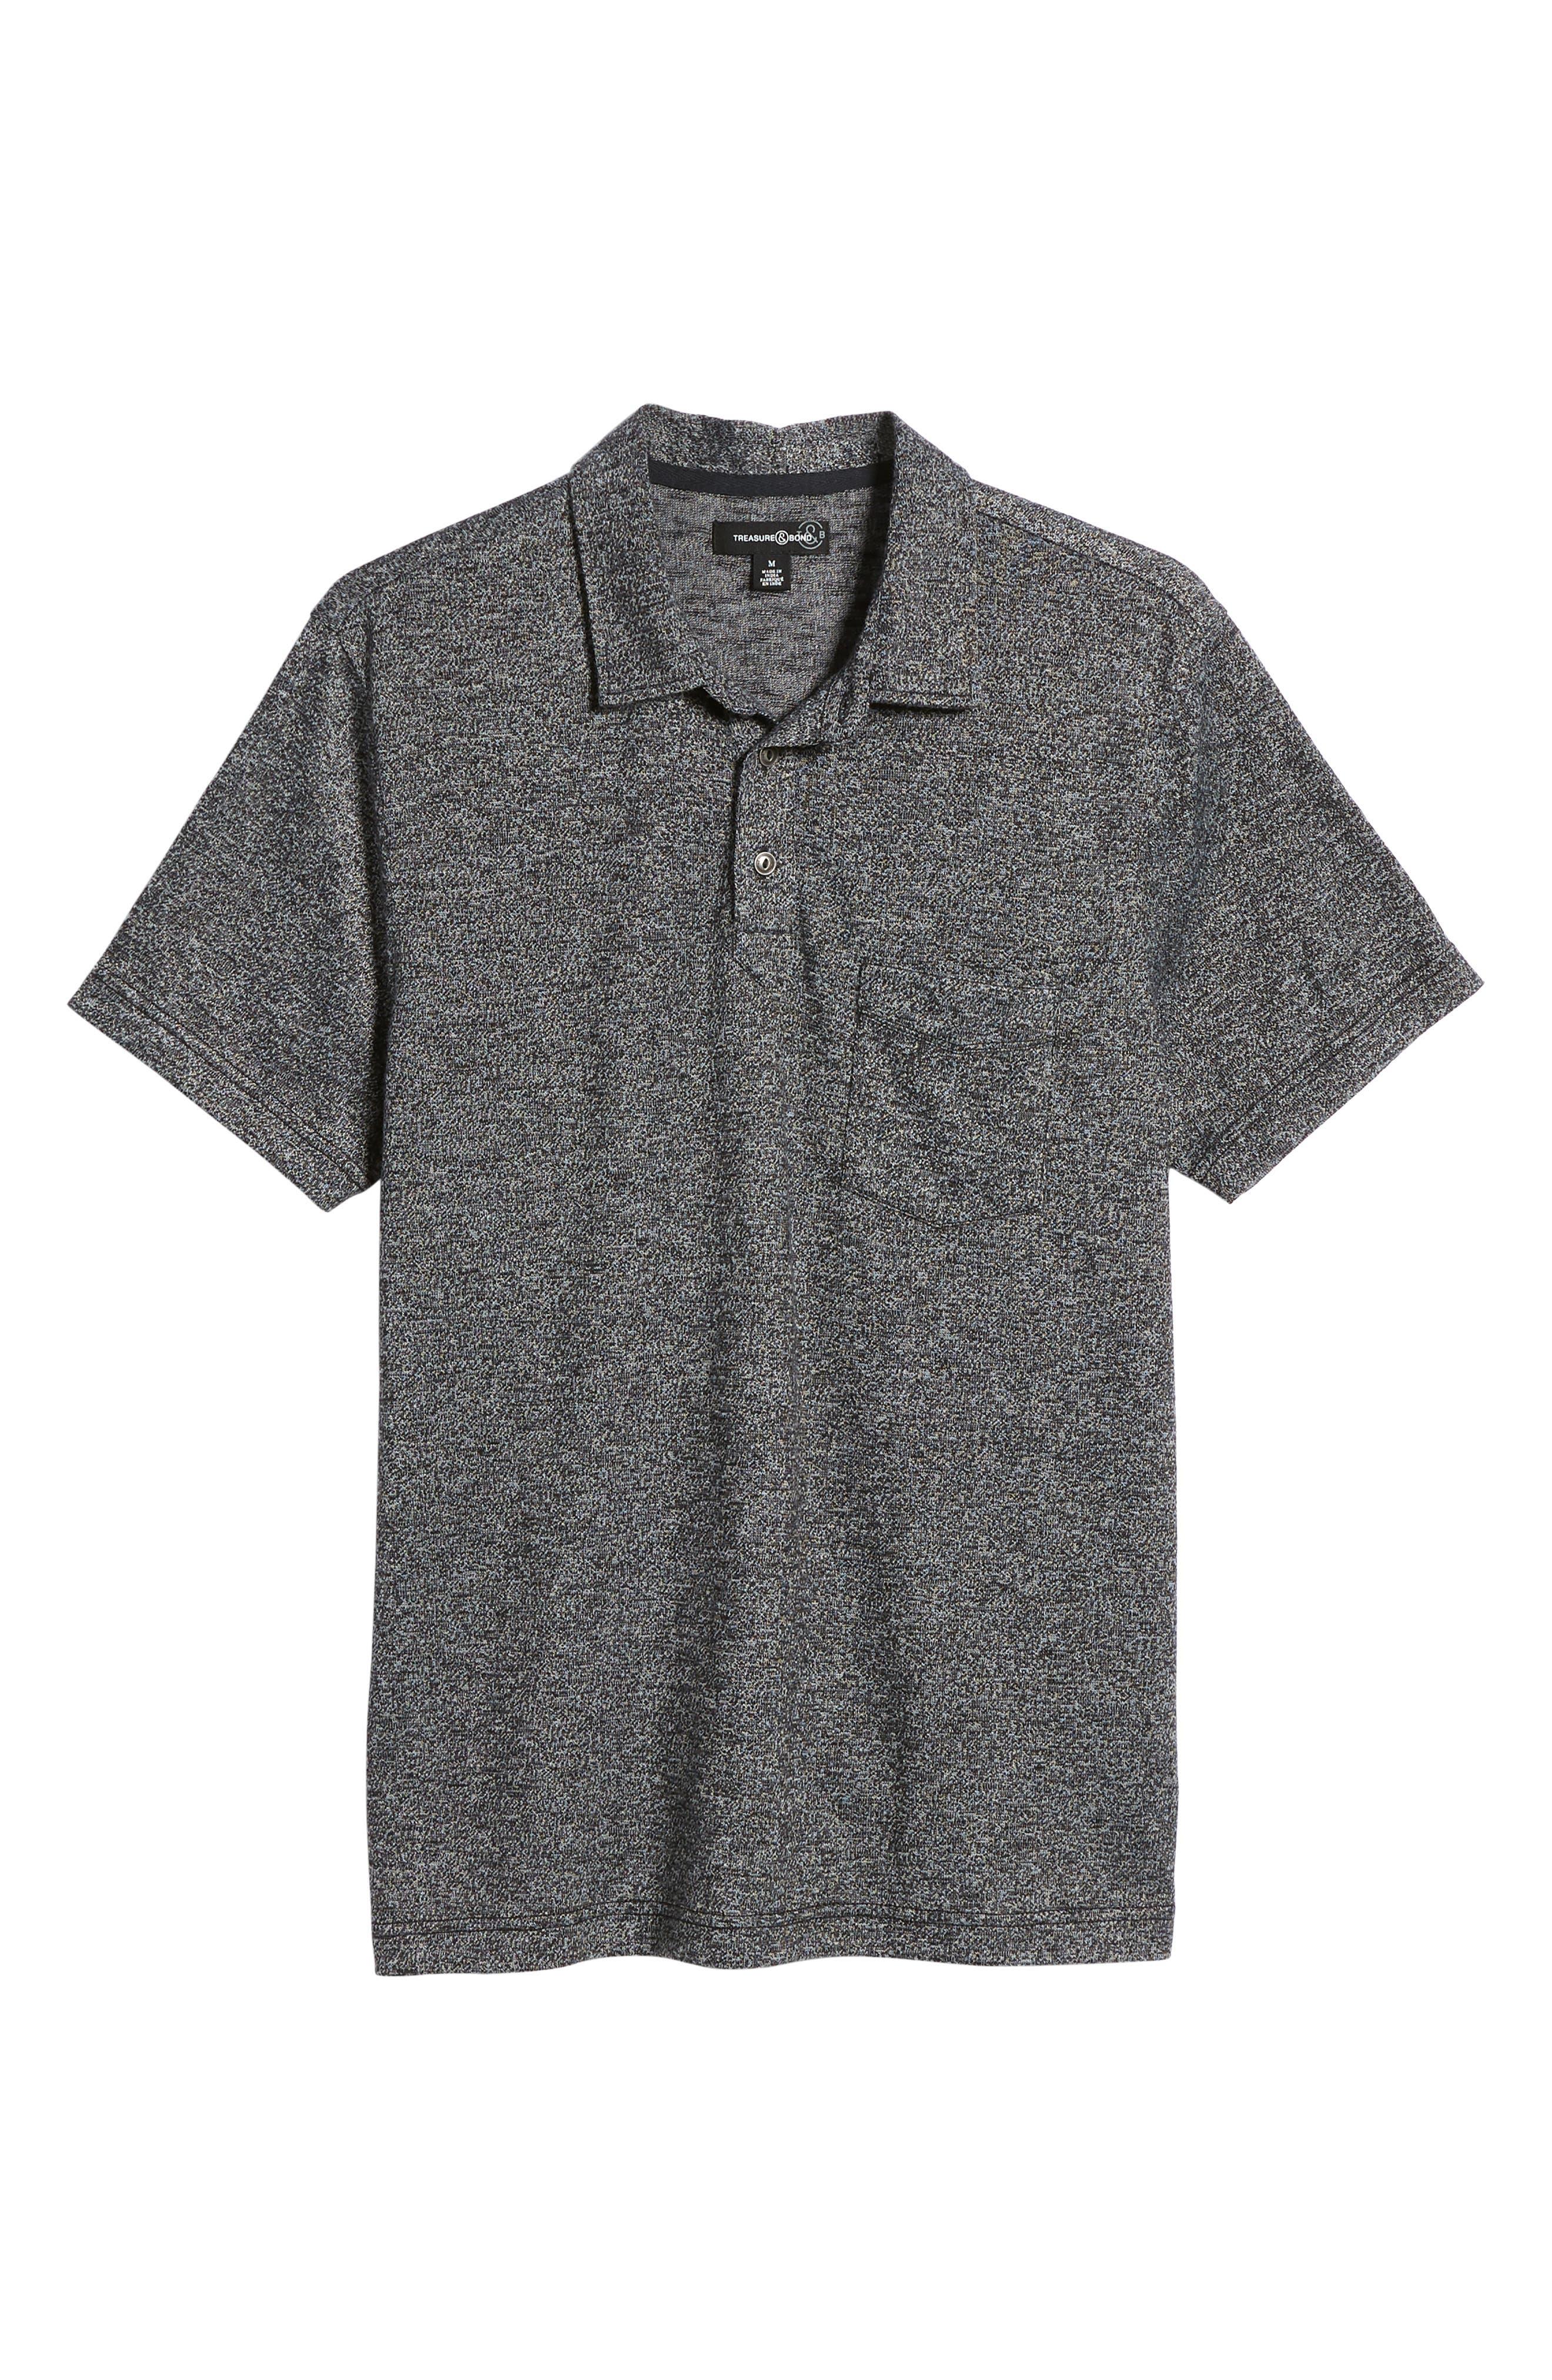 TREASURE & BOND,                             Marled Knit Polo,                             Alternate thumbnail 6, color,                             001